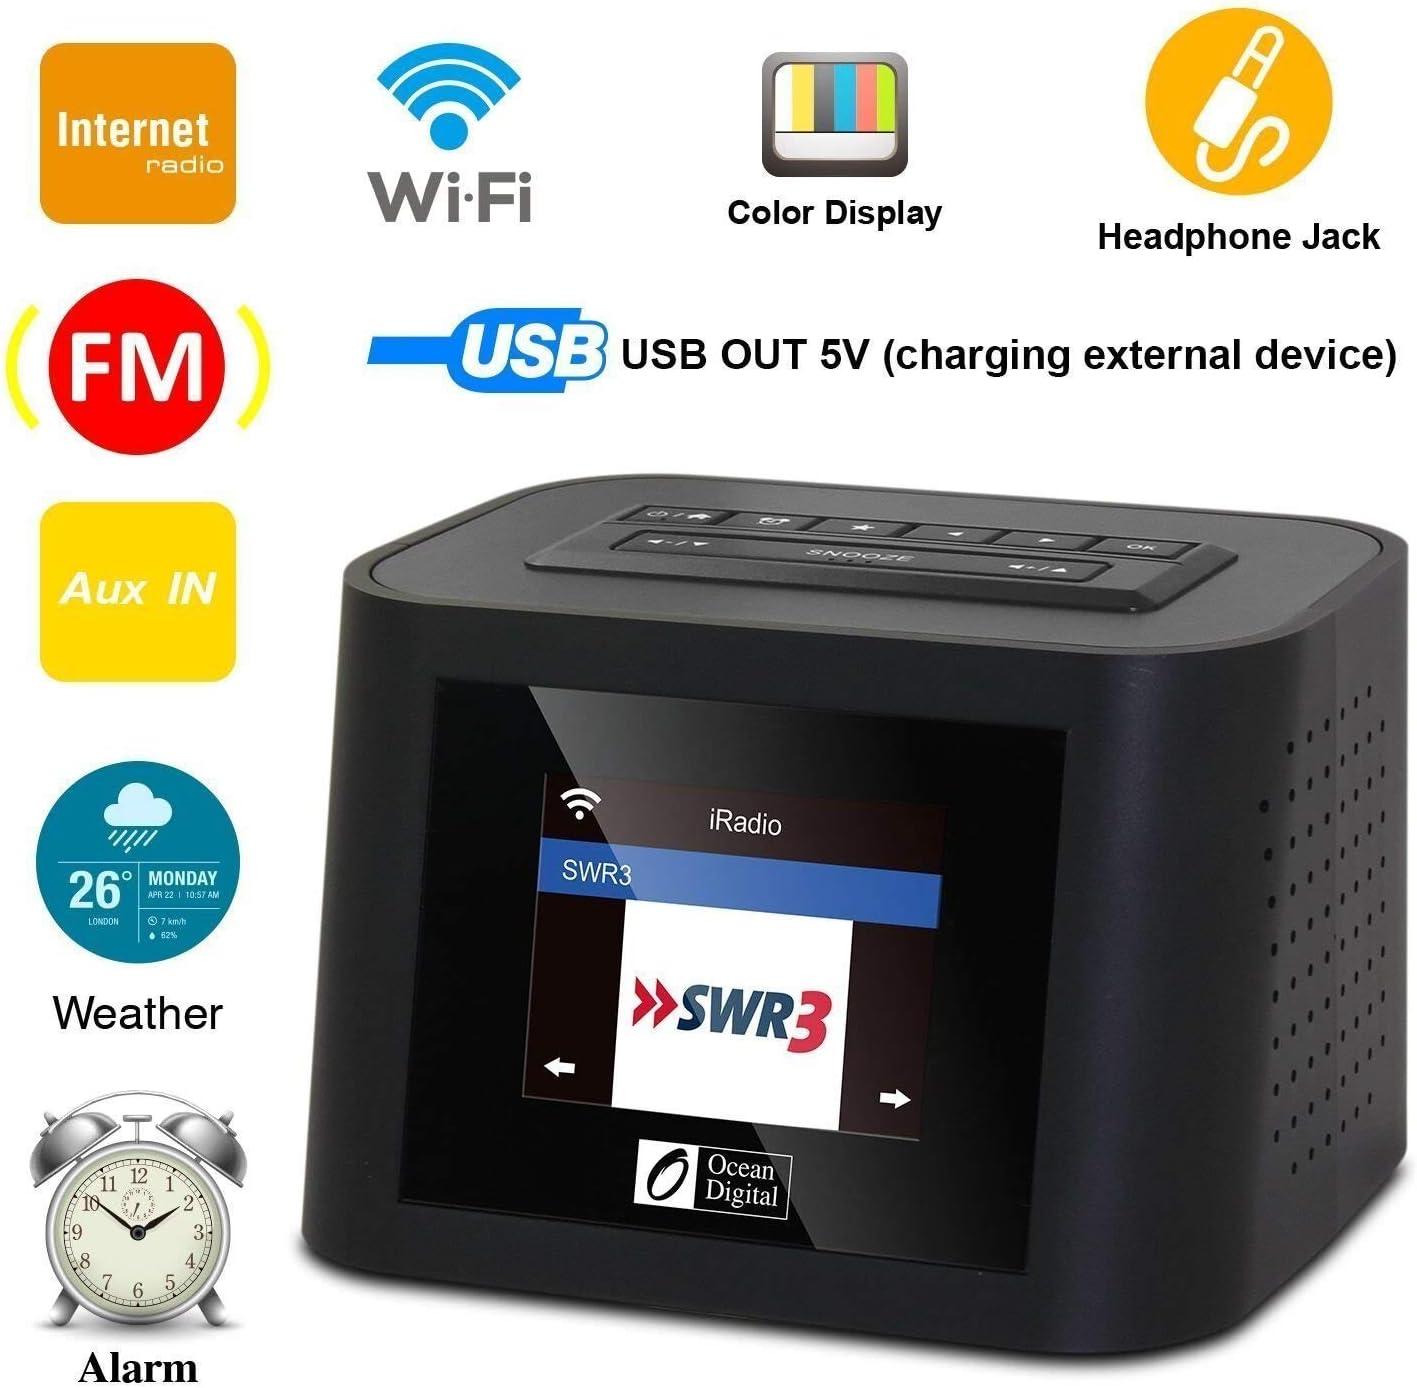 Ocean Digital Wi-Fi Internet Radios WR828F FM Receiver with Airmusic Control APP & Sleep Radio- for Sleeping & Relaxation Alarm Clock Stereo Dual ...